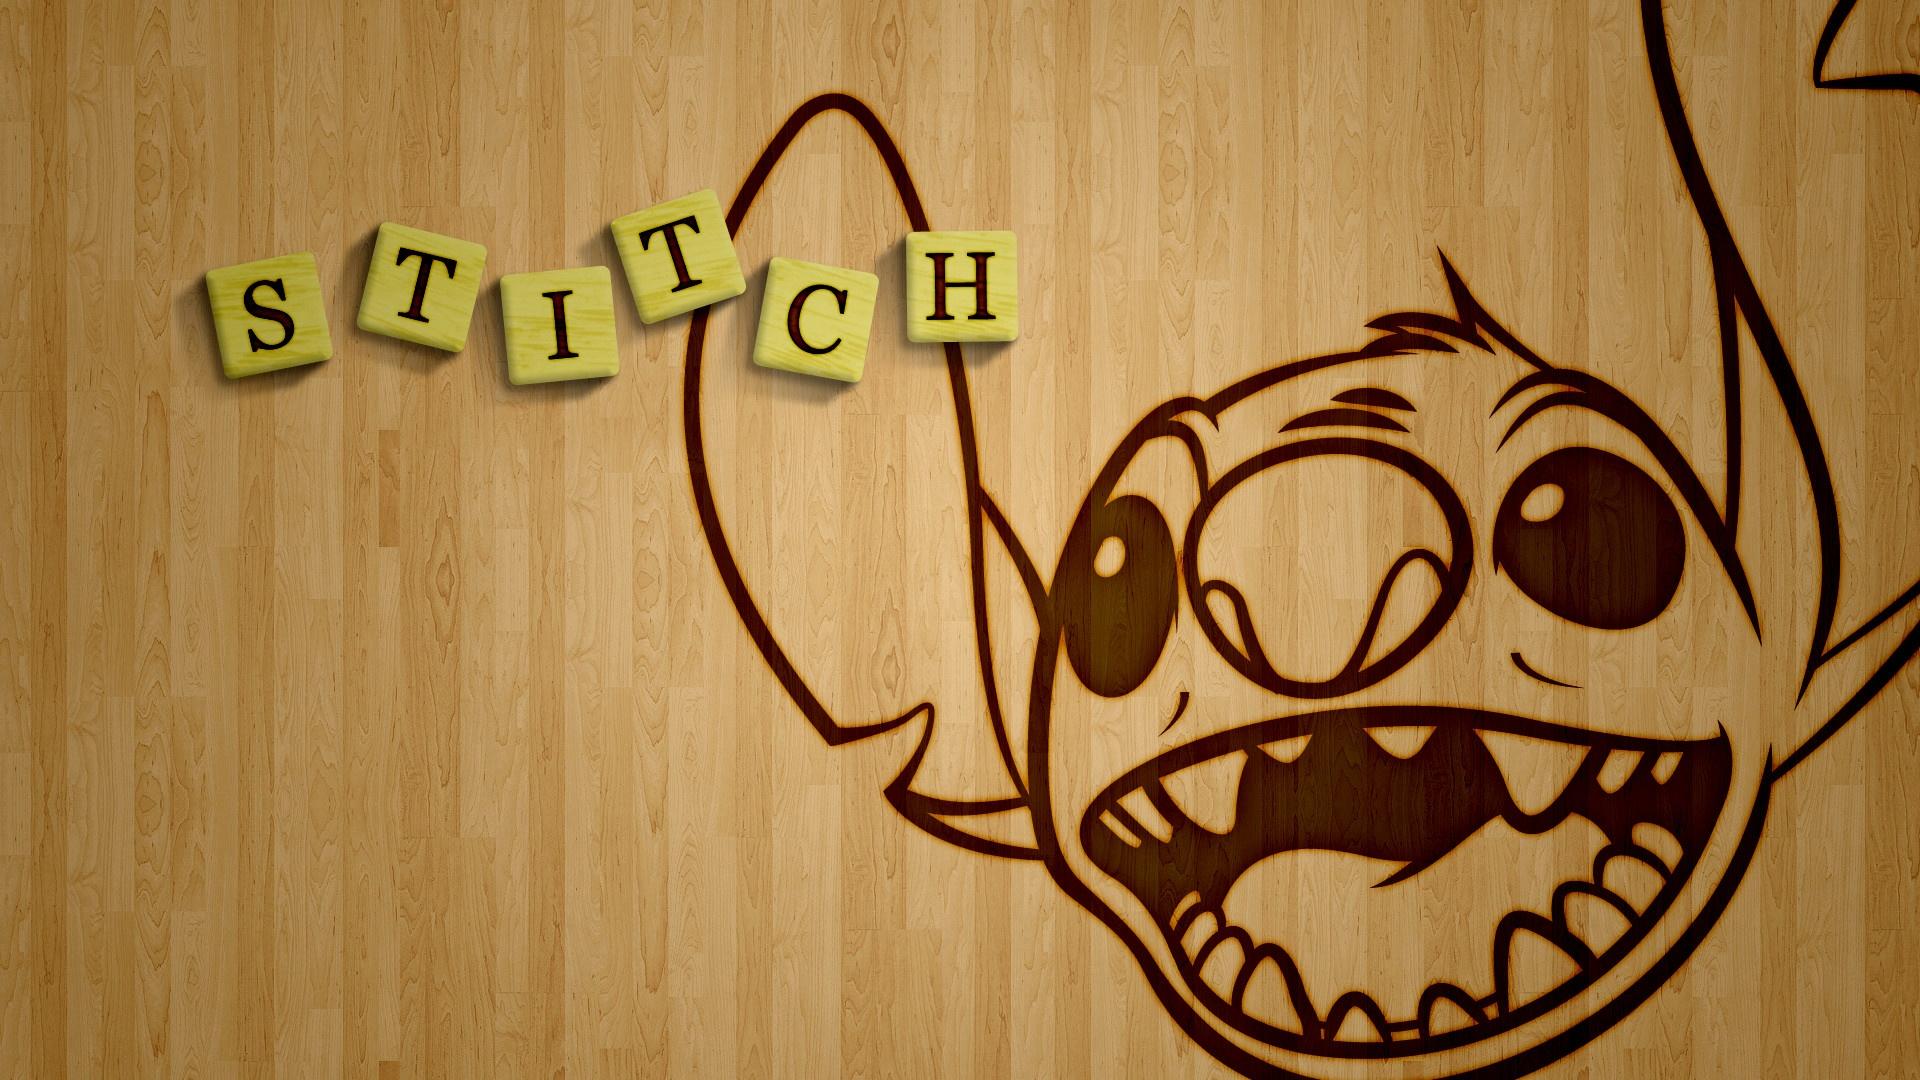 Stitch free picture